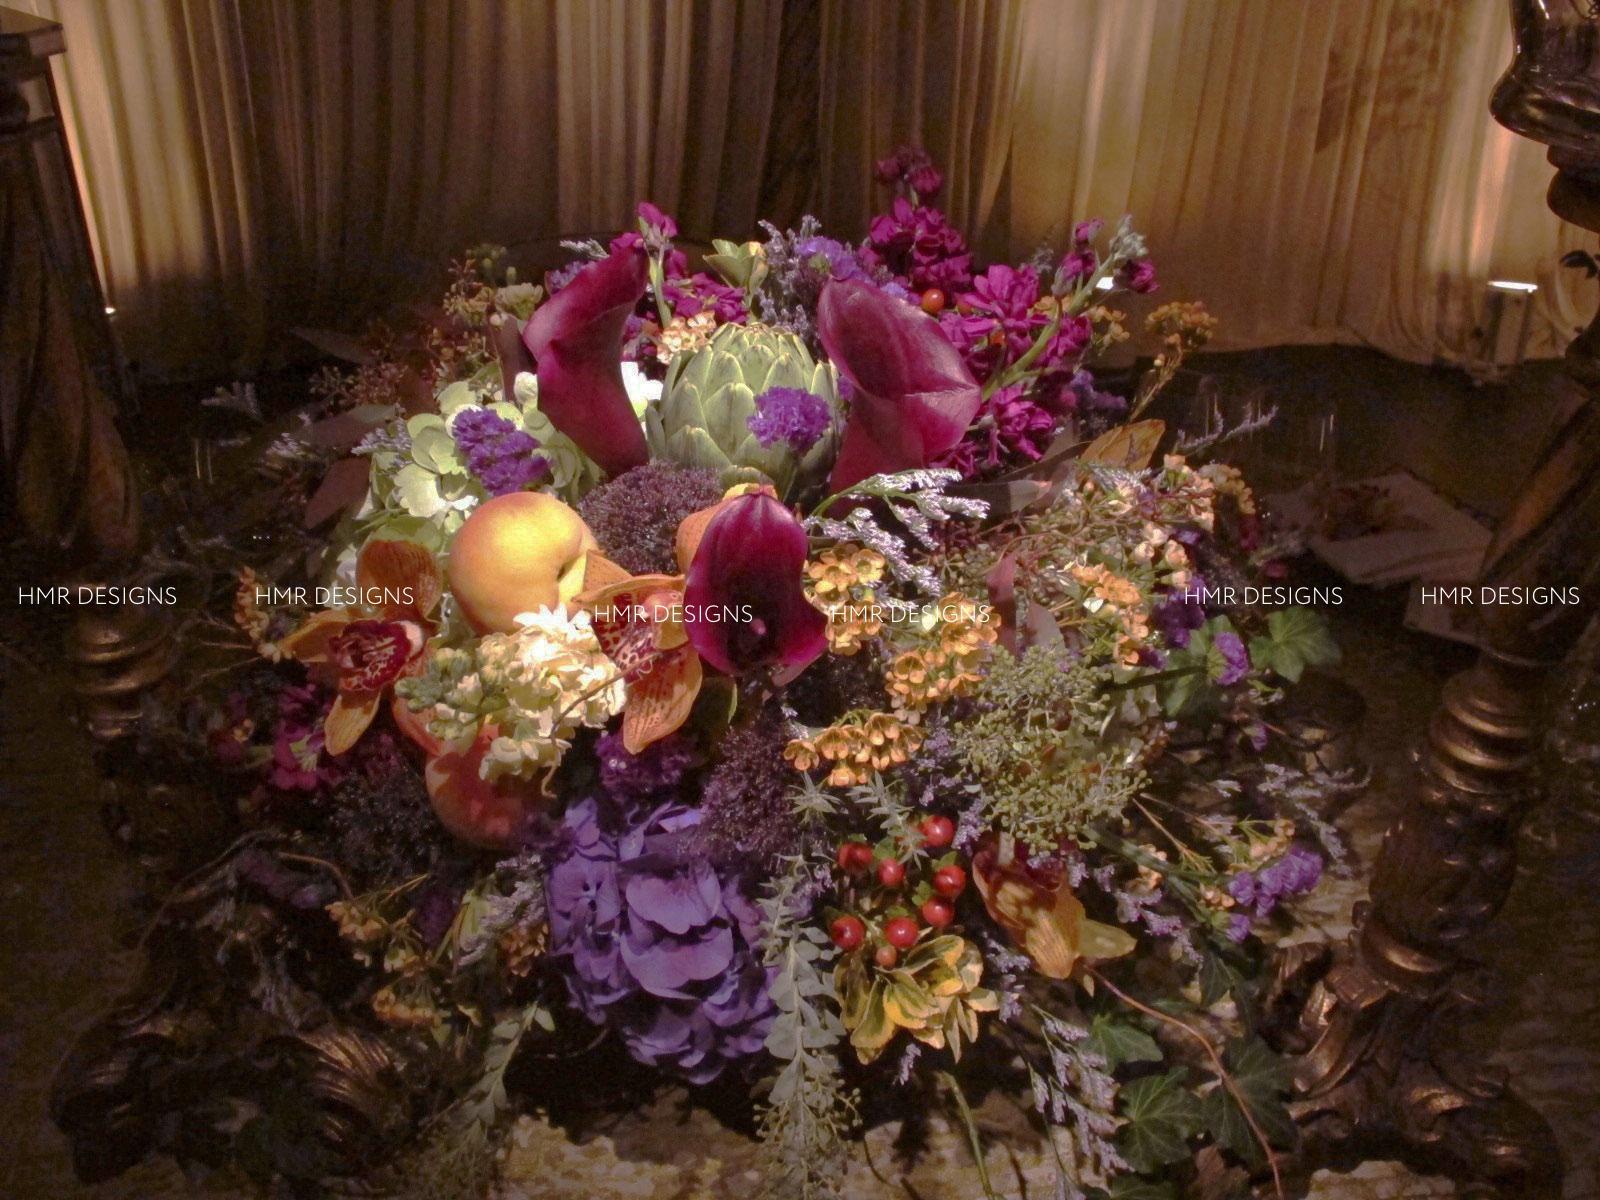 A gorgeous fall arrangement by HMR Designs